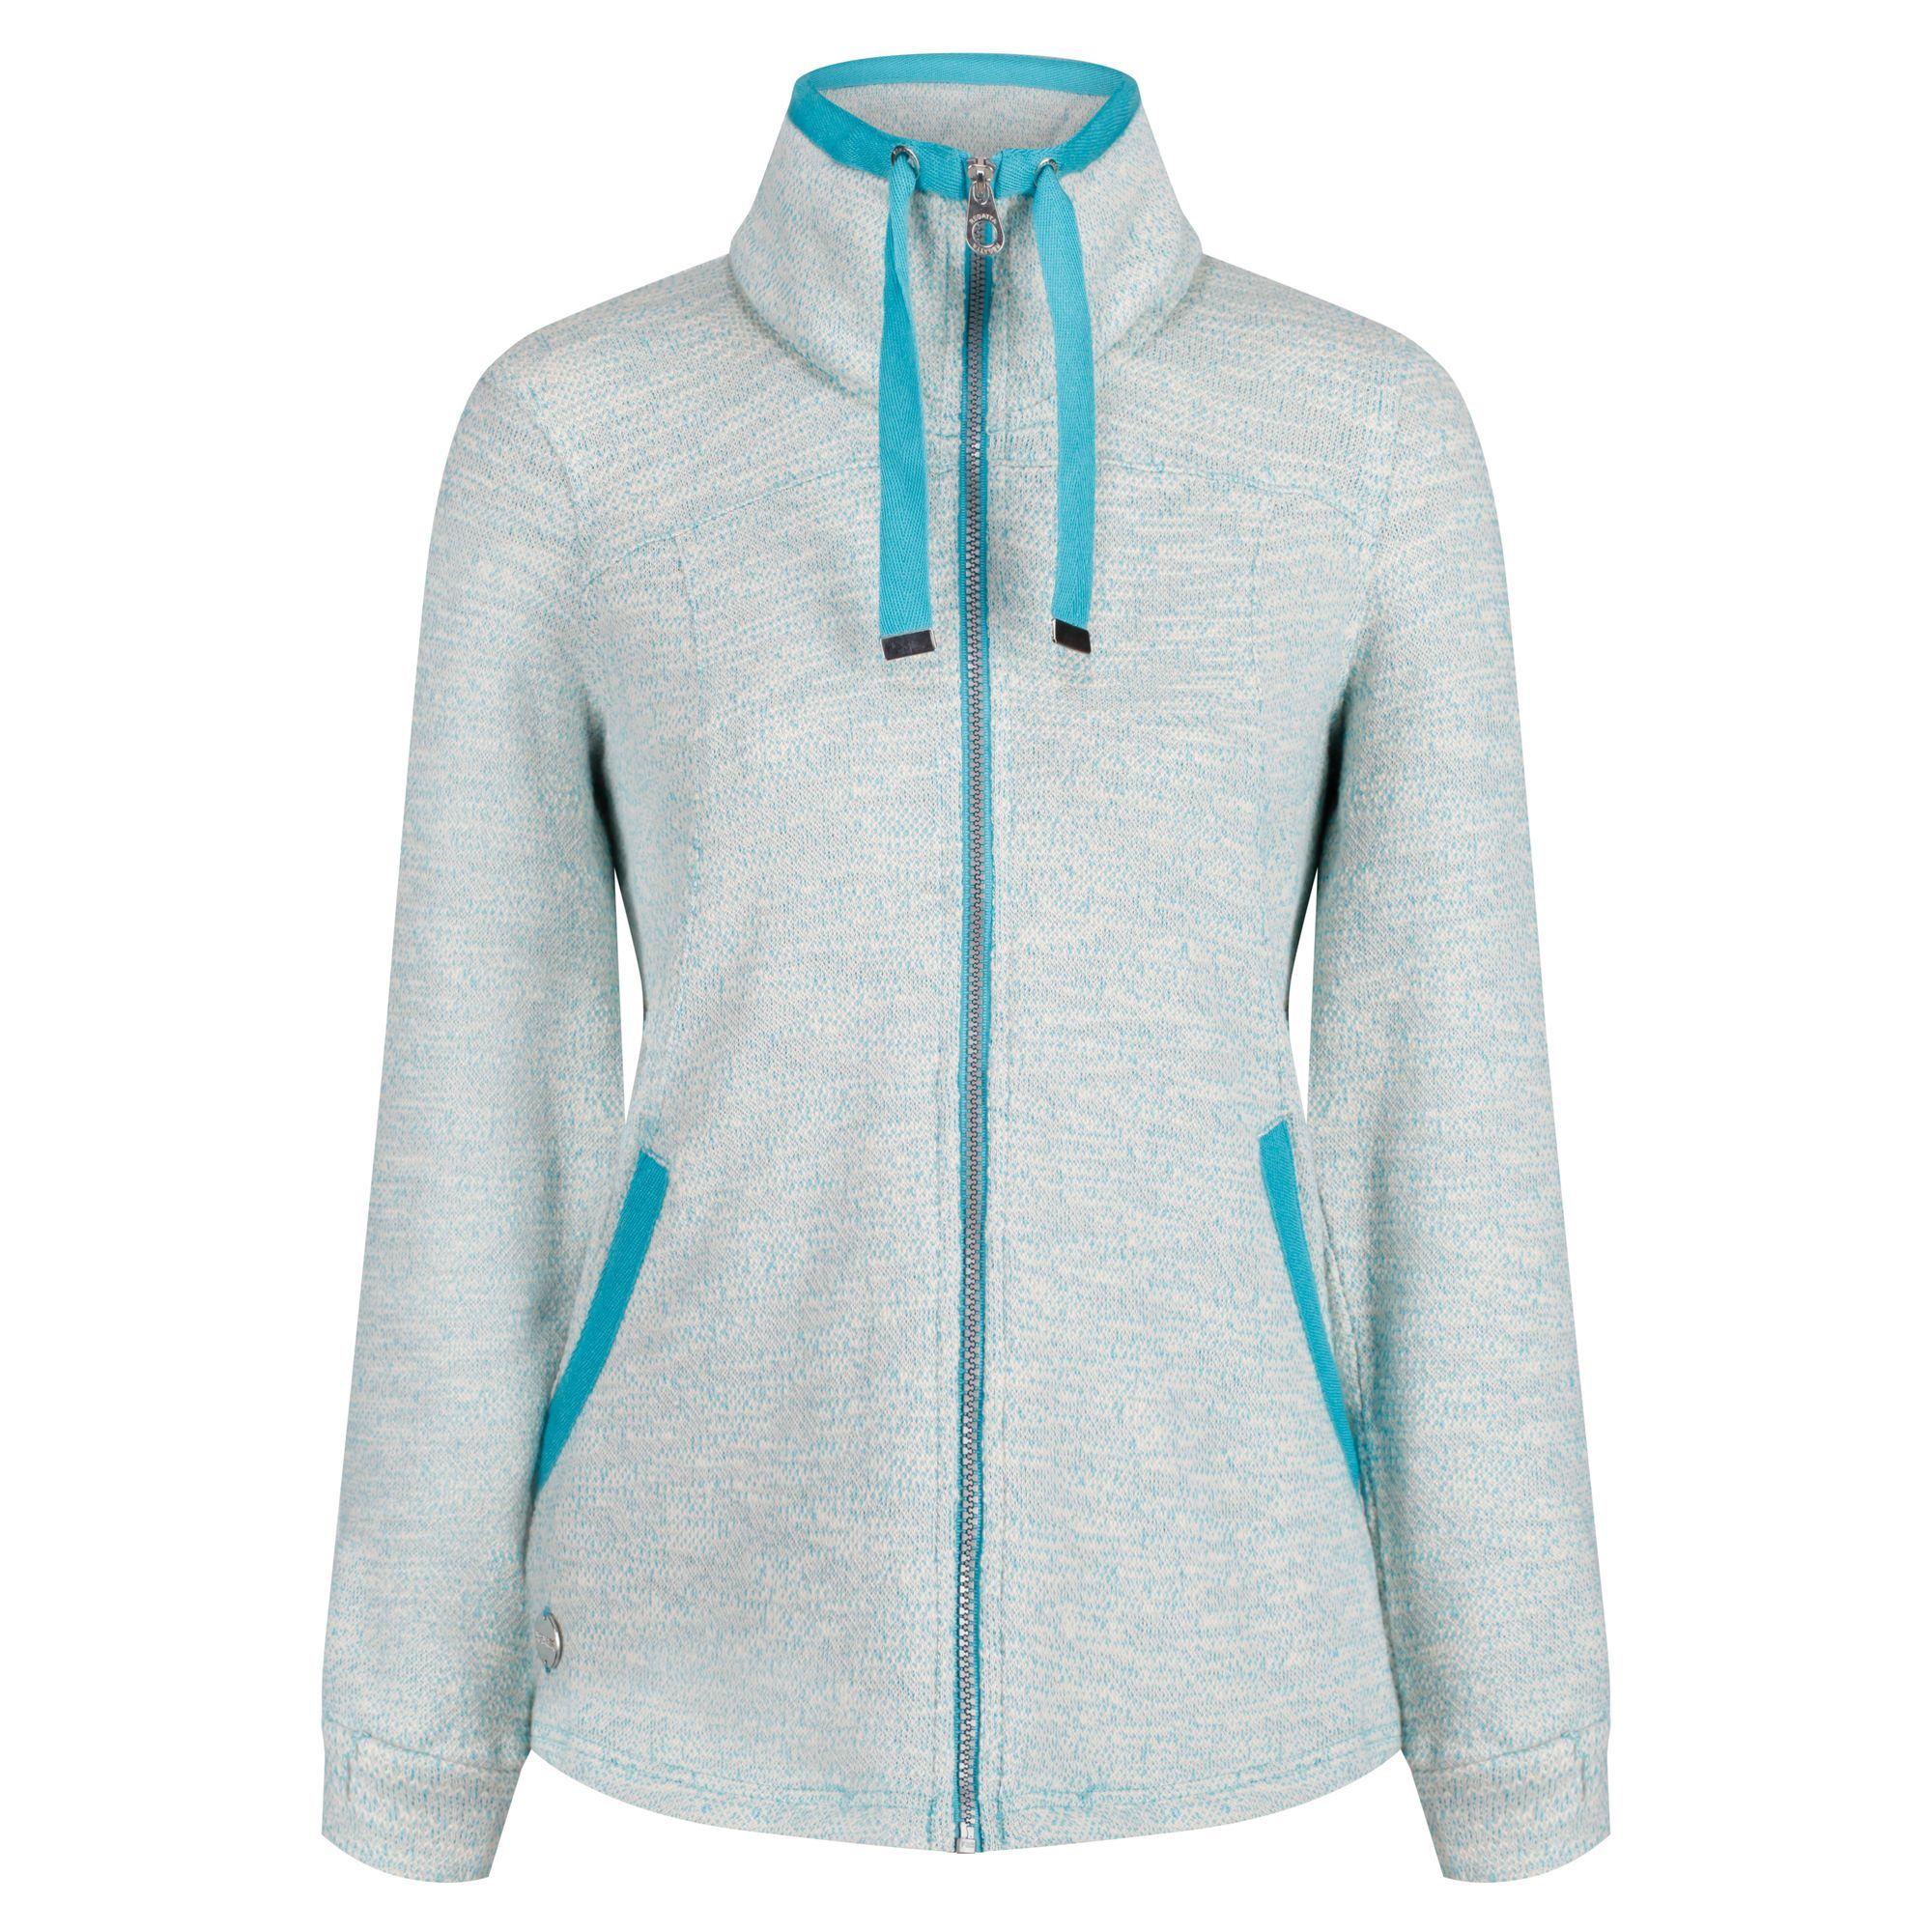 Regatta-Odetta-Womens-Warm-Curved-Full-Zip-Fleece-Jacket-RRP-50 thumbnail 4